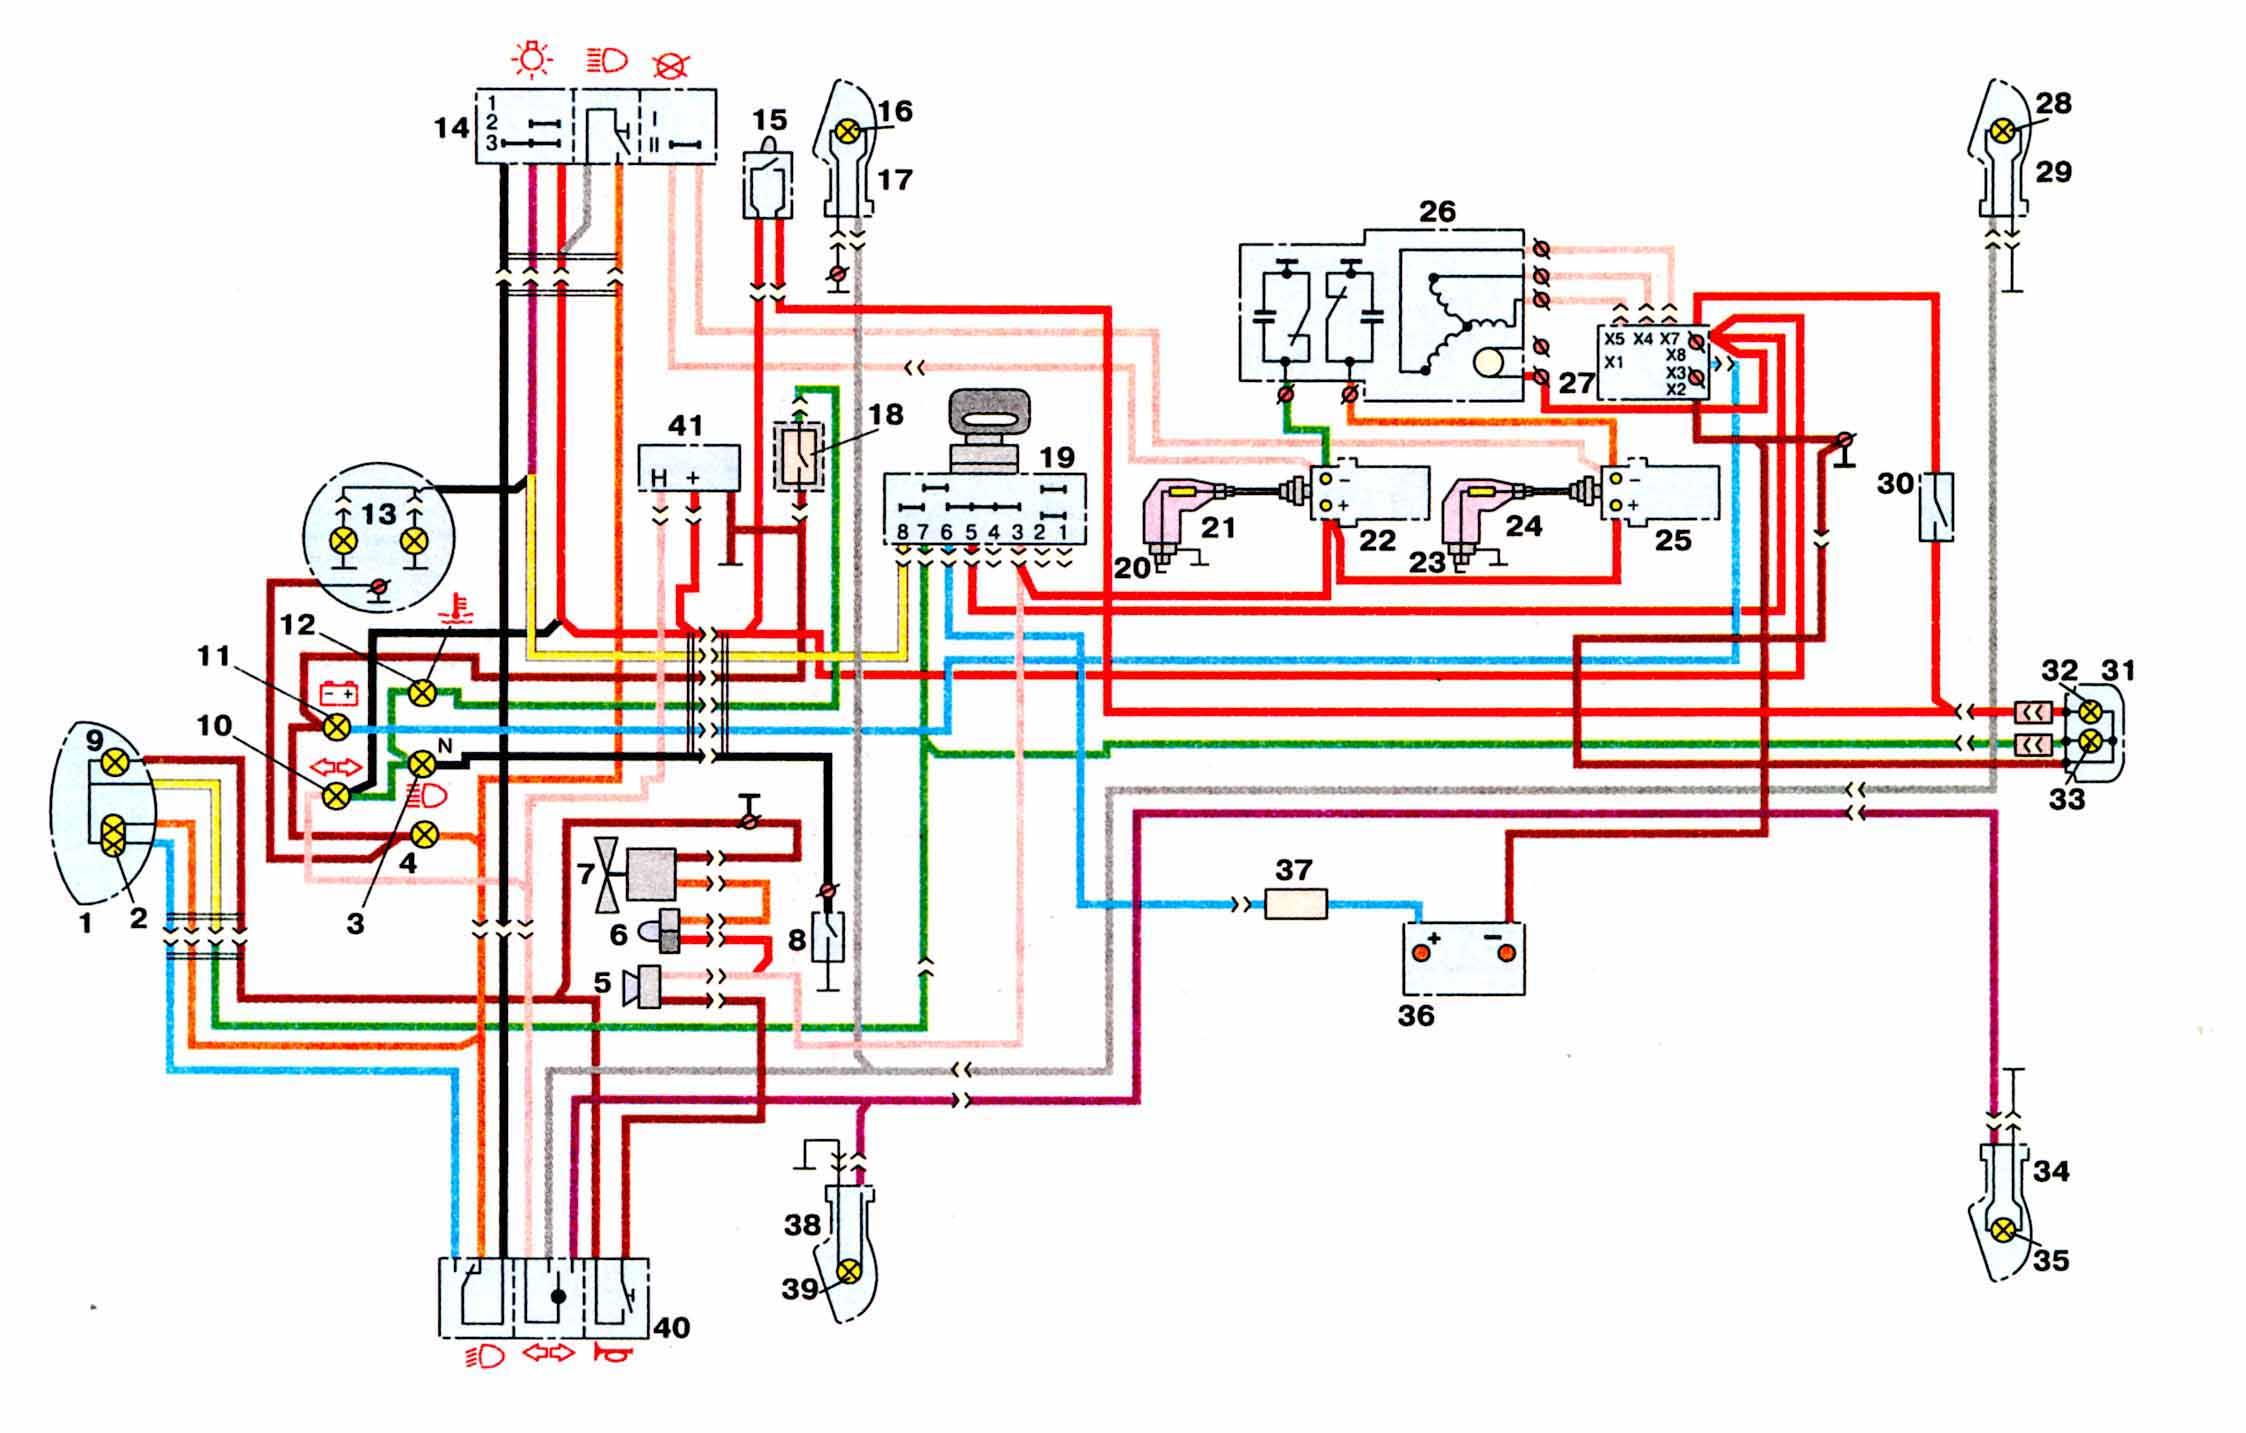 Иж планета схема эл.проводки